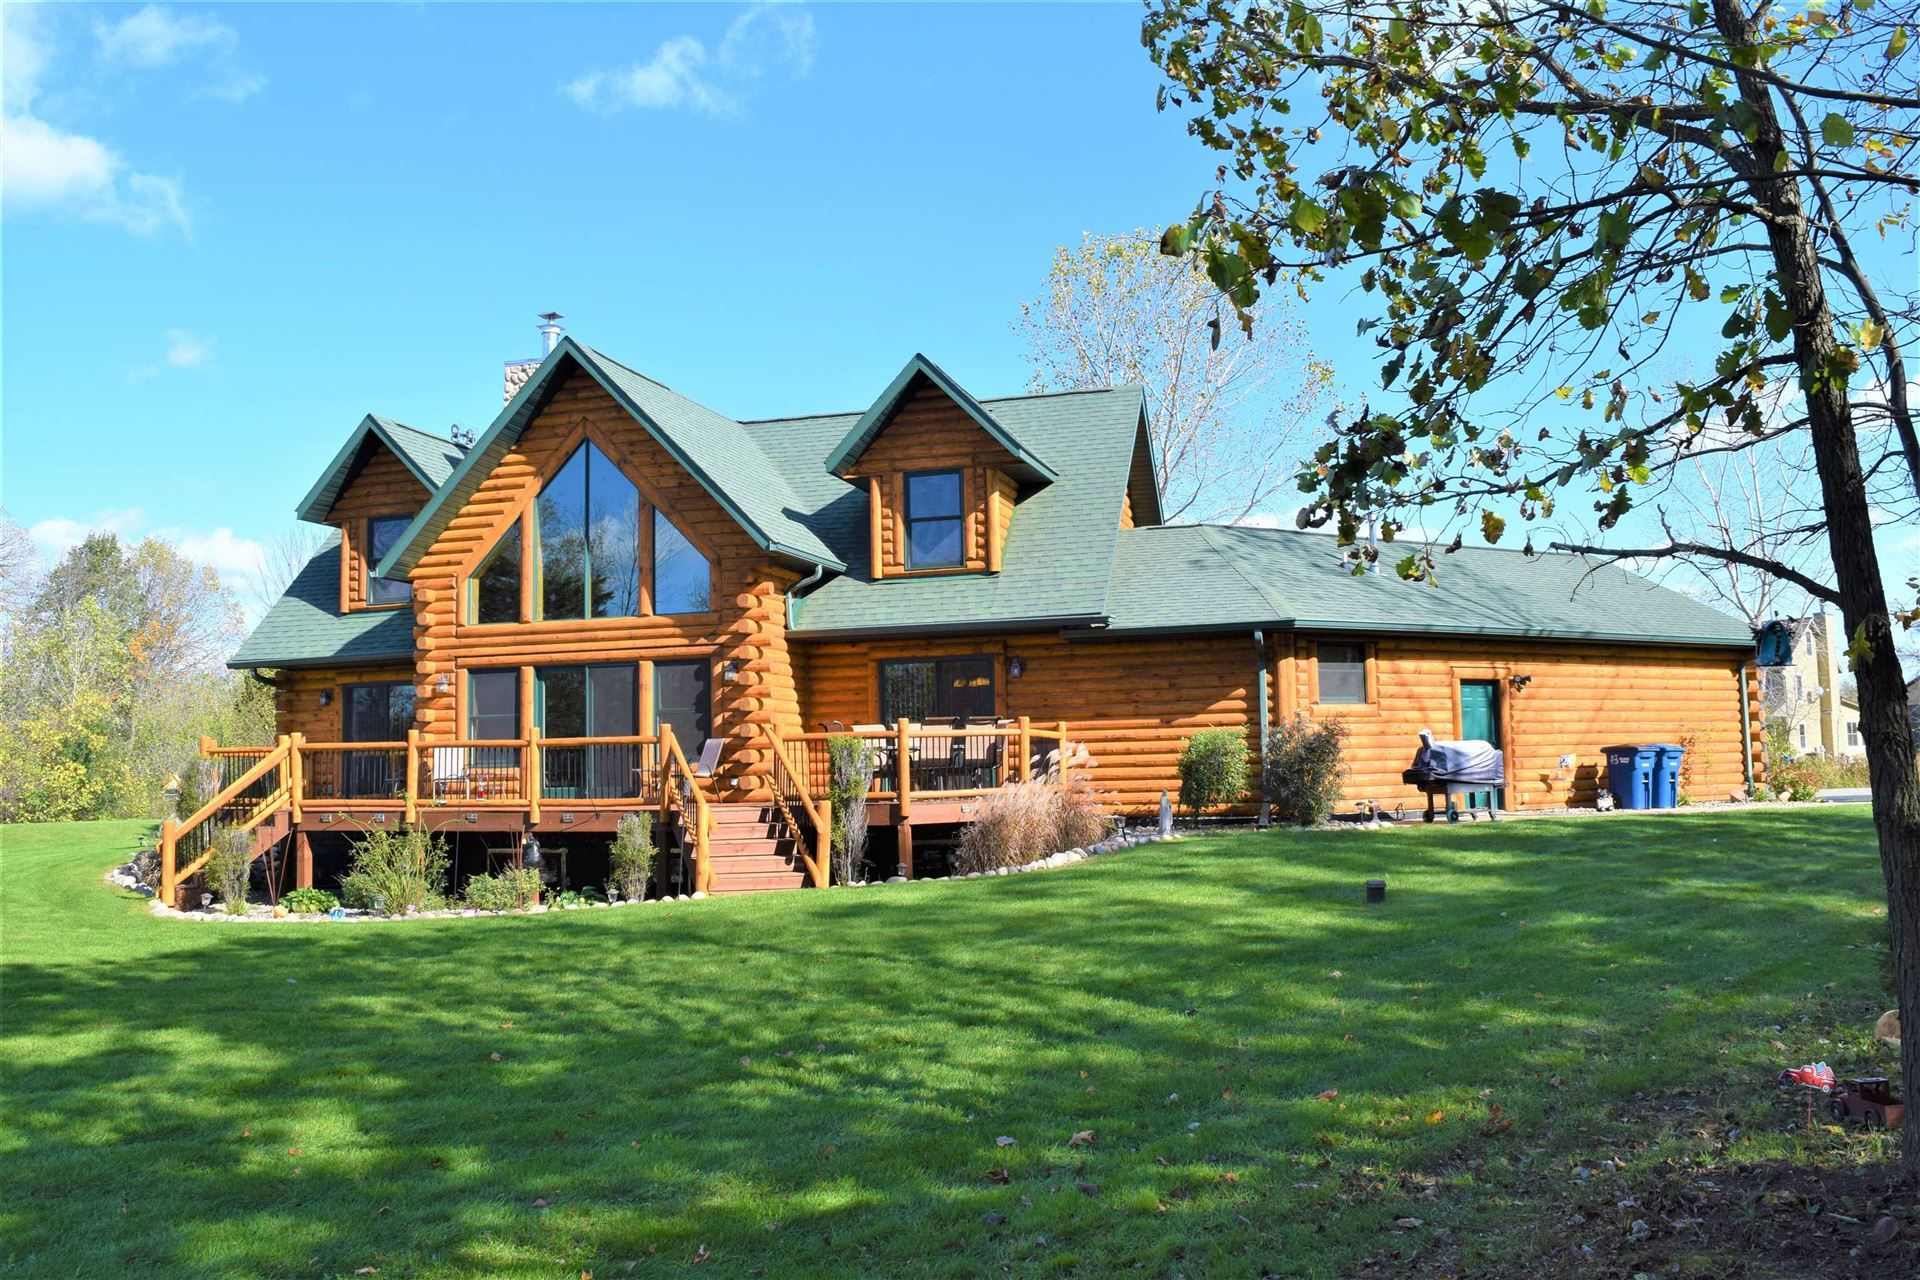 1655 WEYERHORST CREEK Road, Oshkosh, WI 54902 - MLS#: 50249805